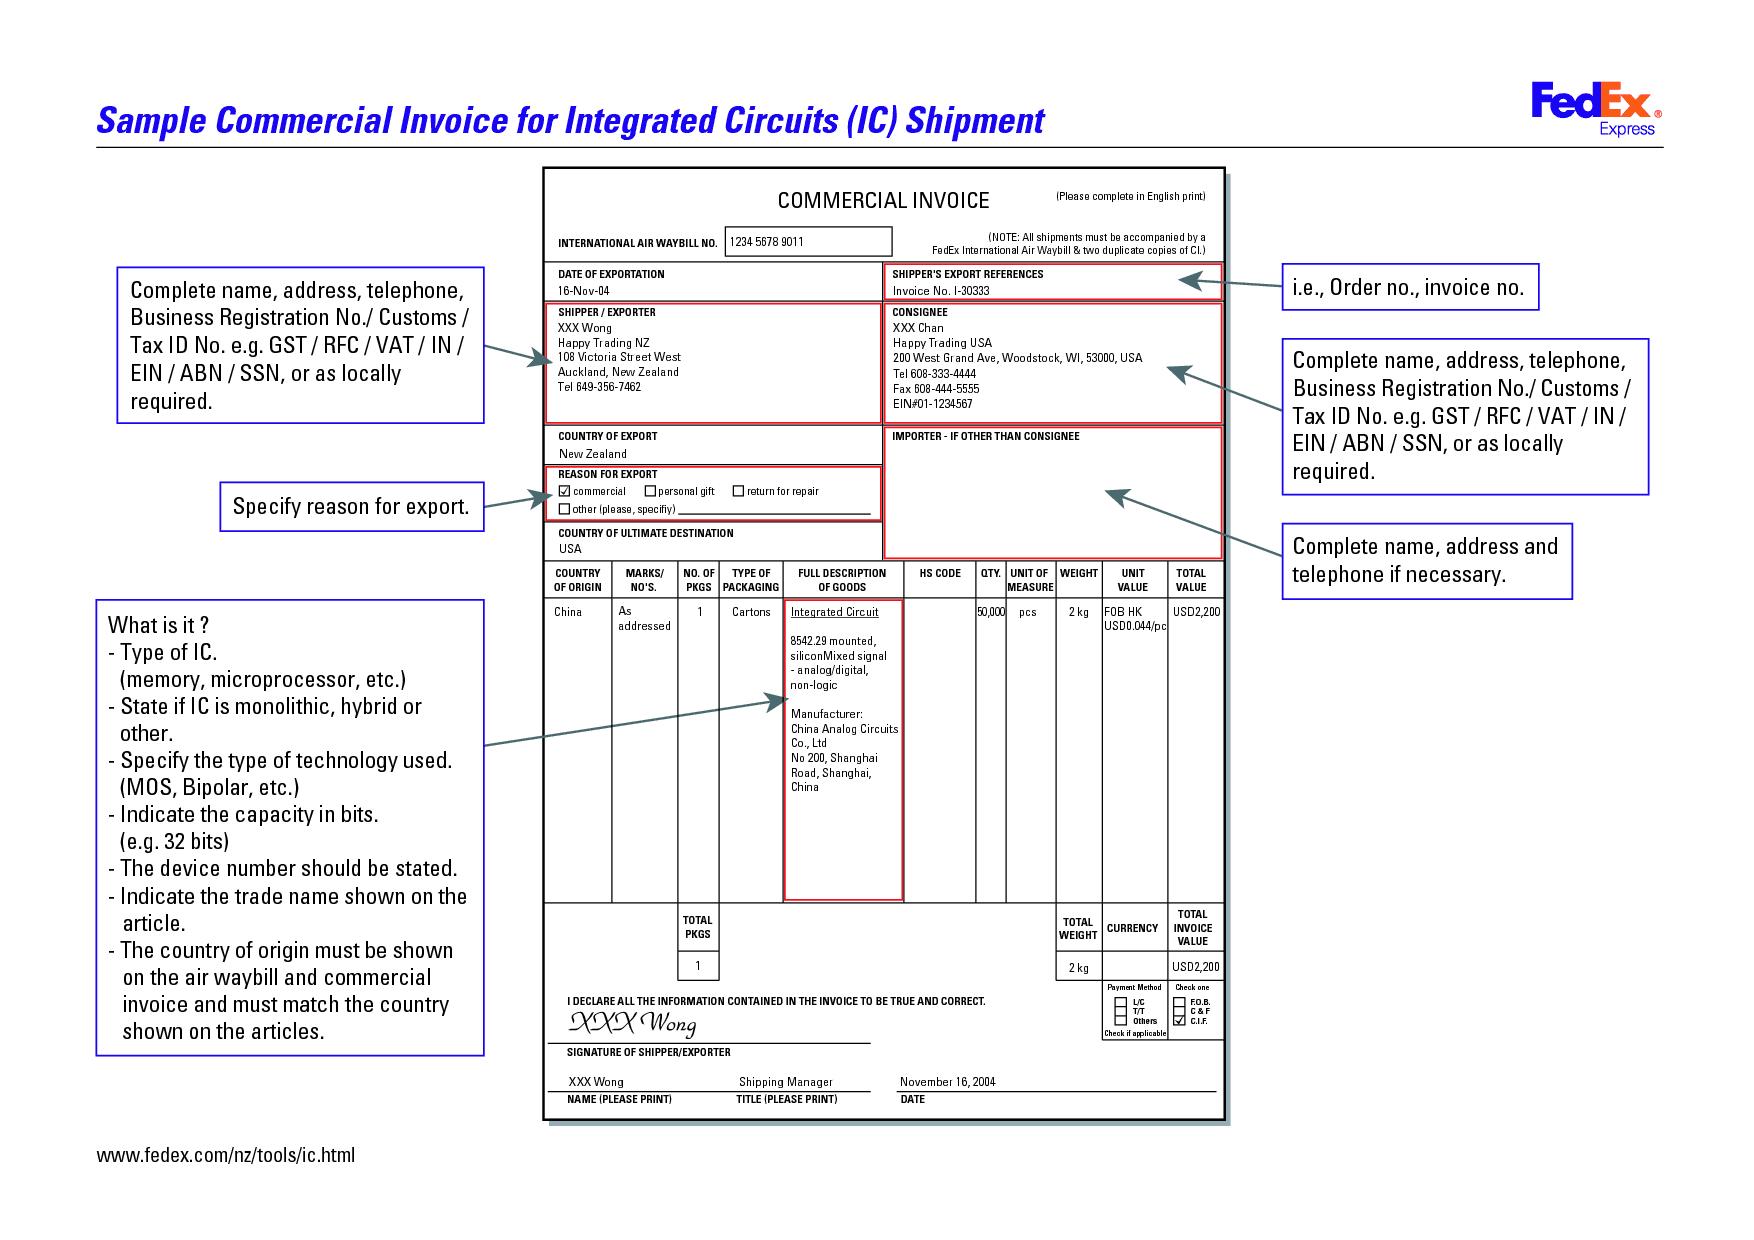 Commercial Invoice Fedex